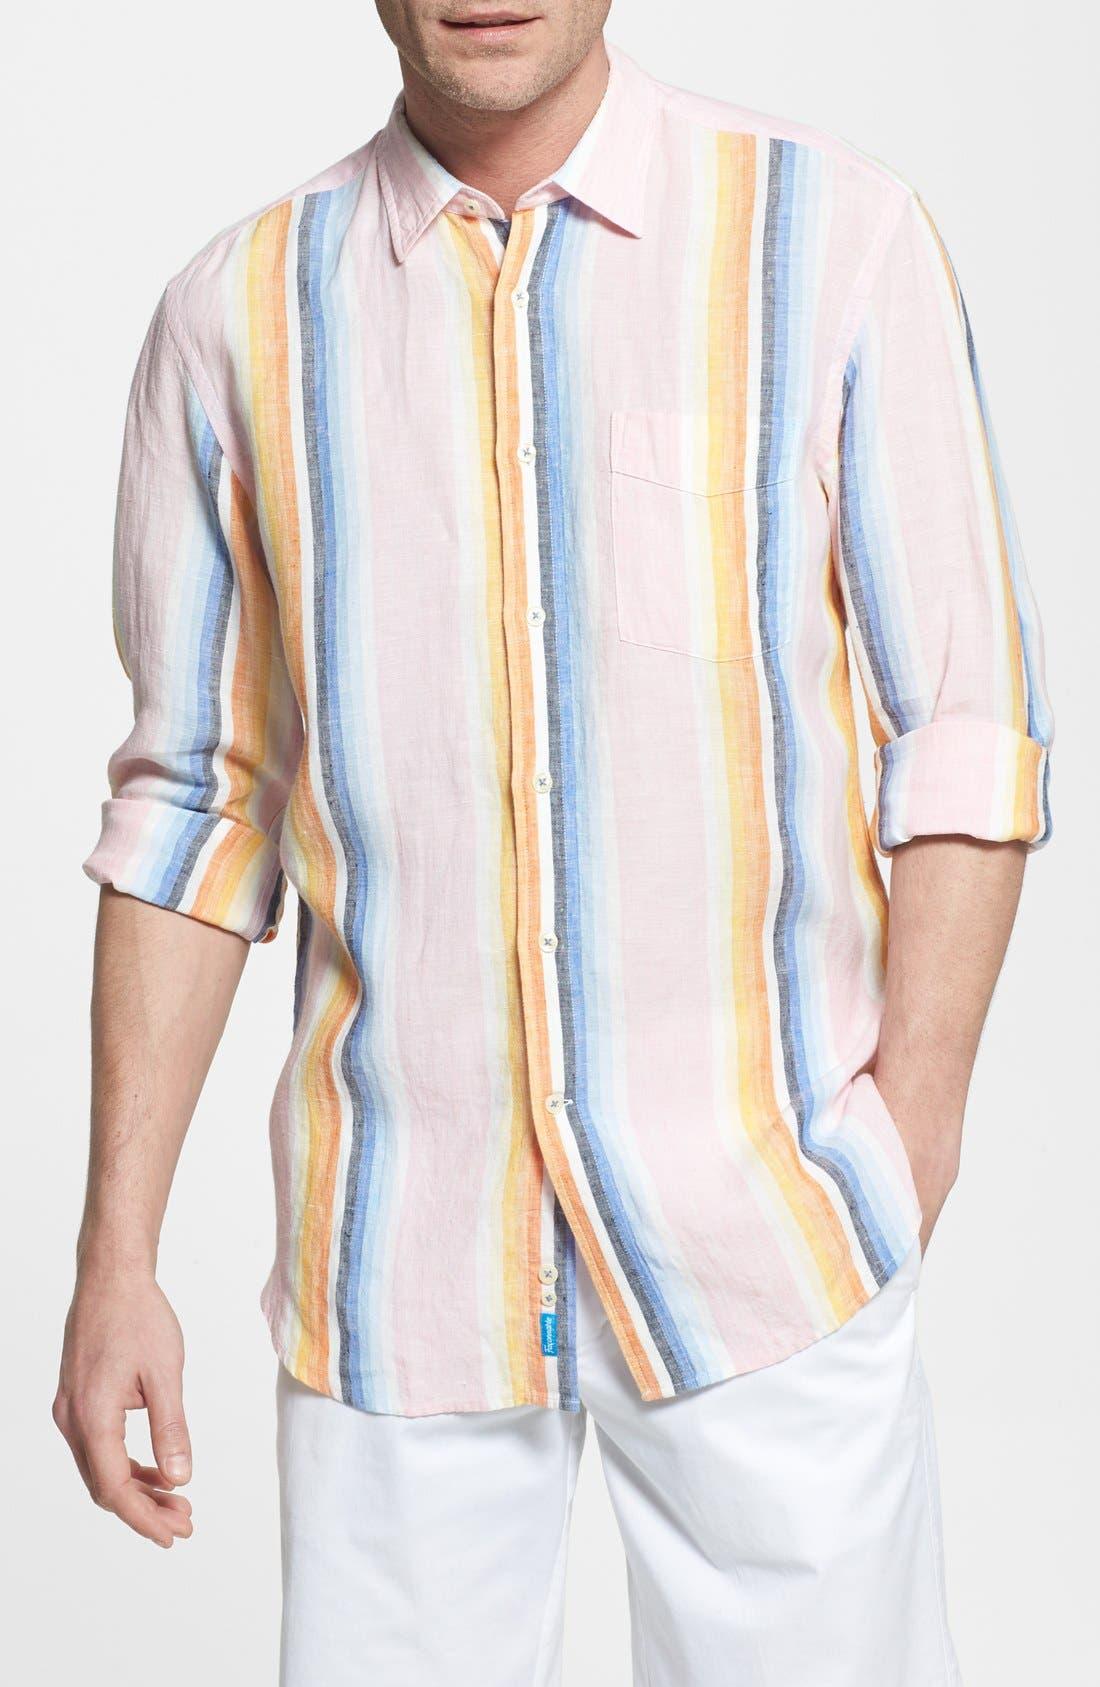 Alternate Image 1 Selected - Façonnable 'Azur' Club Fit Stripe Linen Sport Shirt